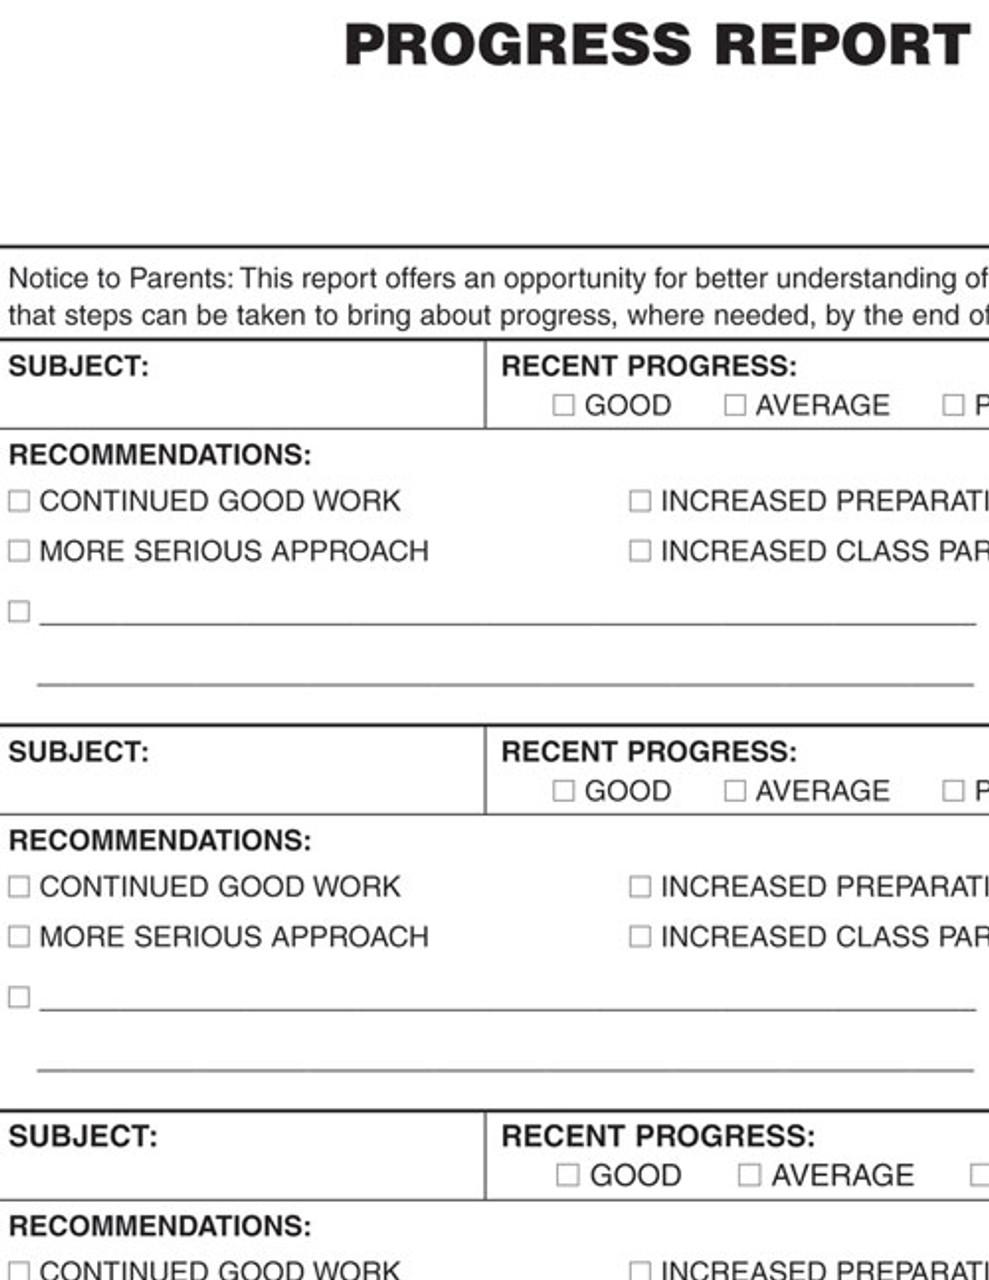 Progress Reports, Multiple Subject (6498)